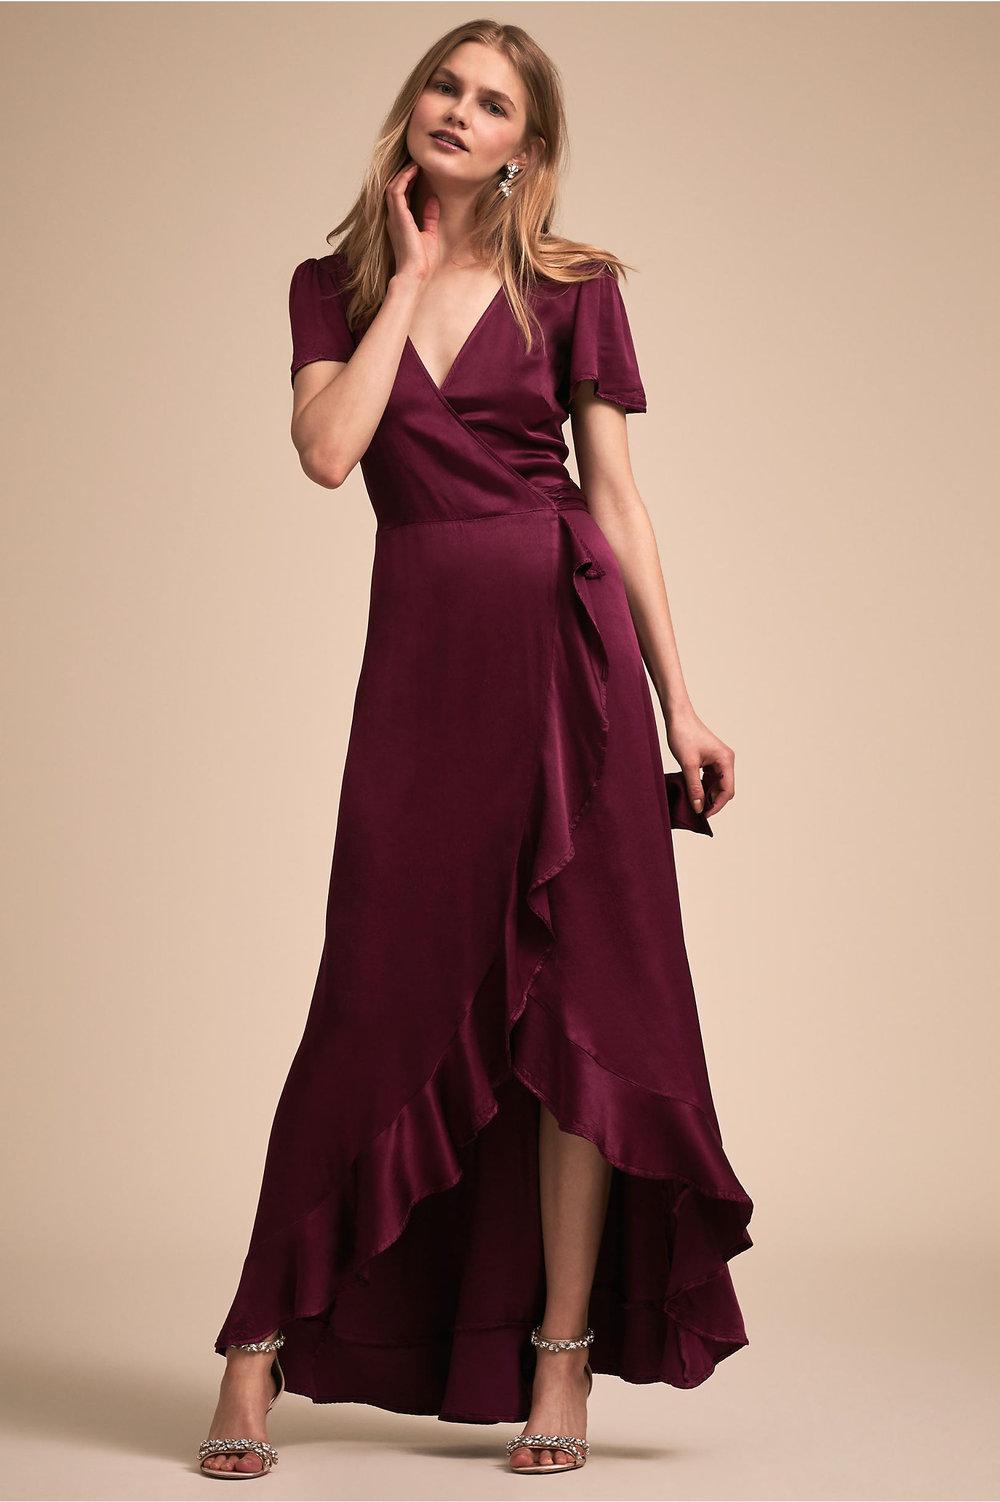 Phoebe Dress in Black Cherry by BHLDN